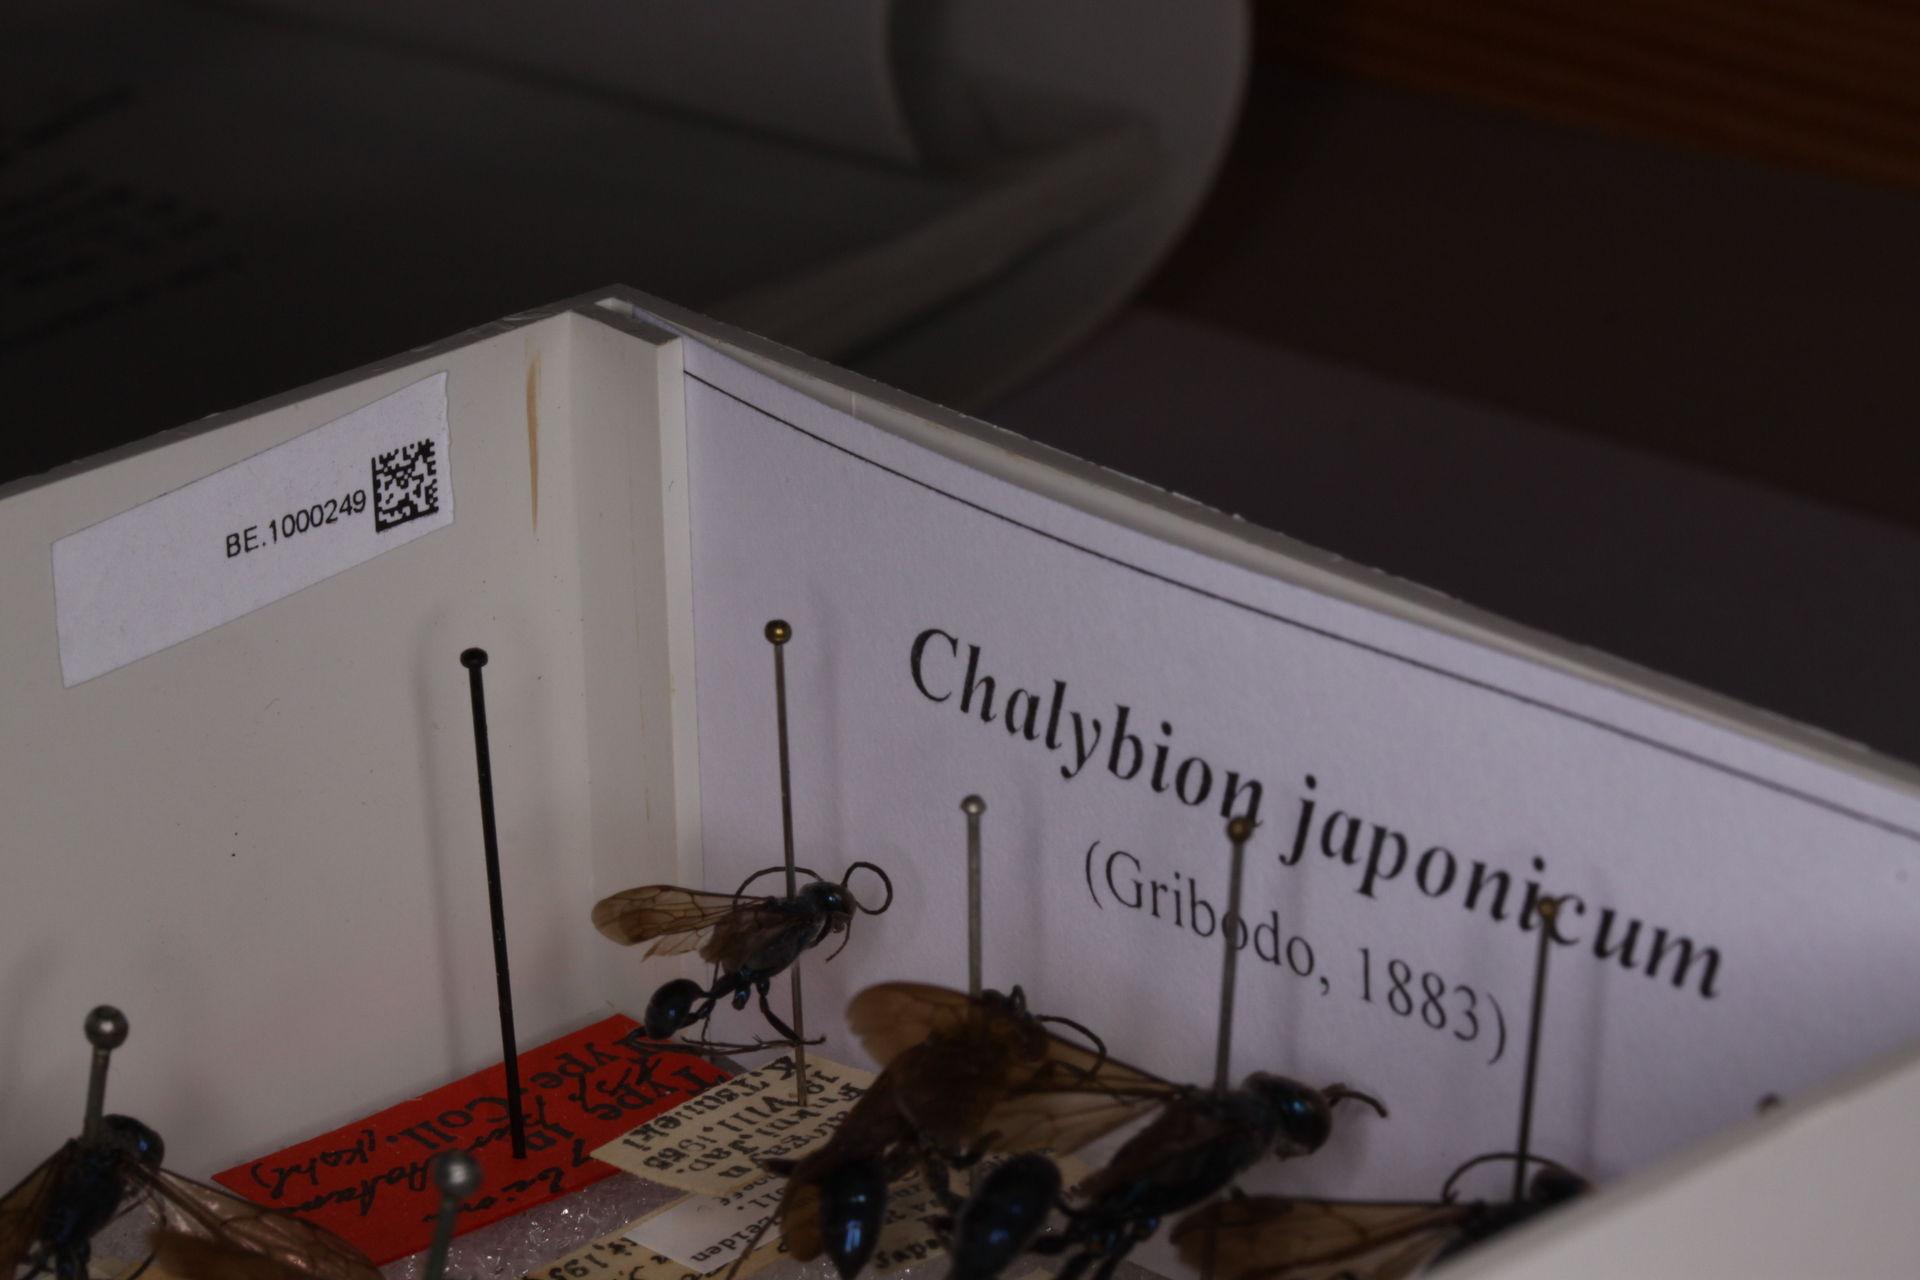 RMNH.INS.591469 | Chalybion japonicum (Gridobo, 1883)